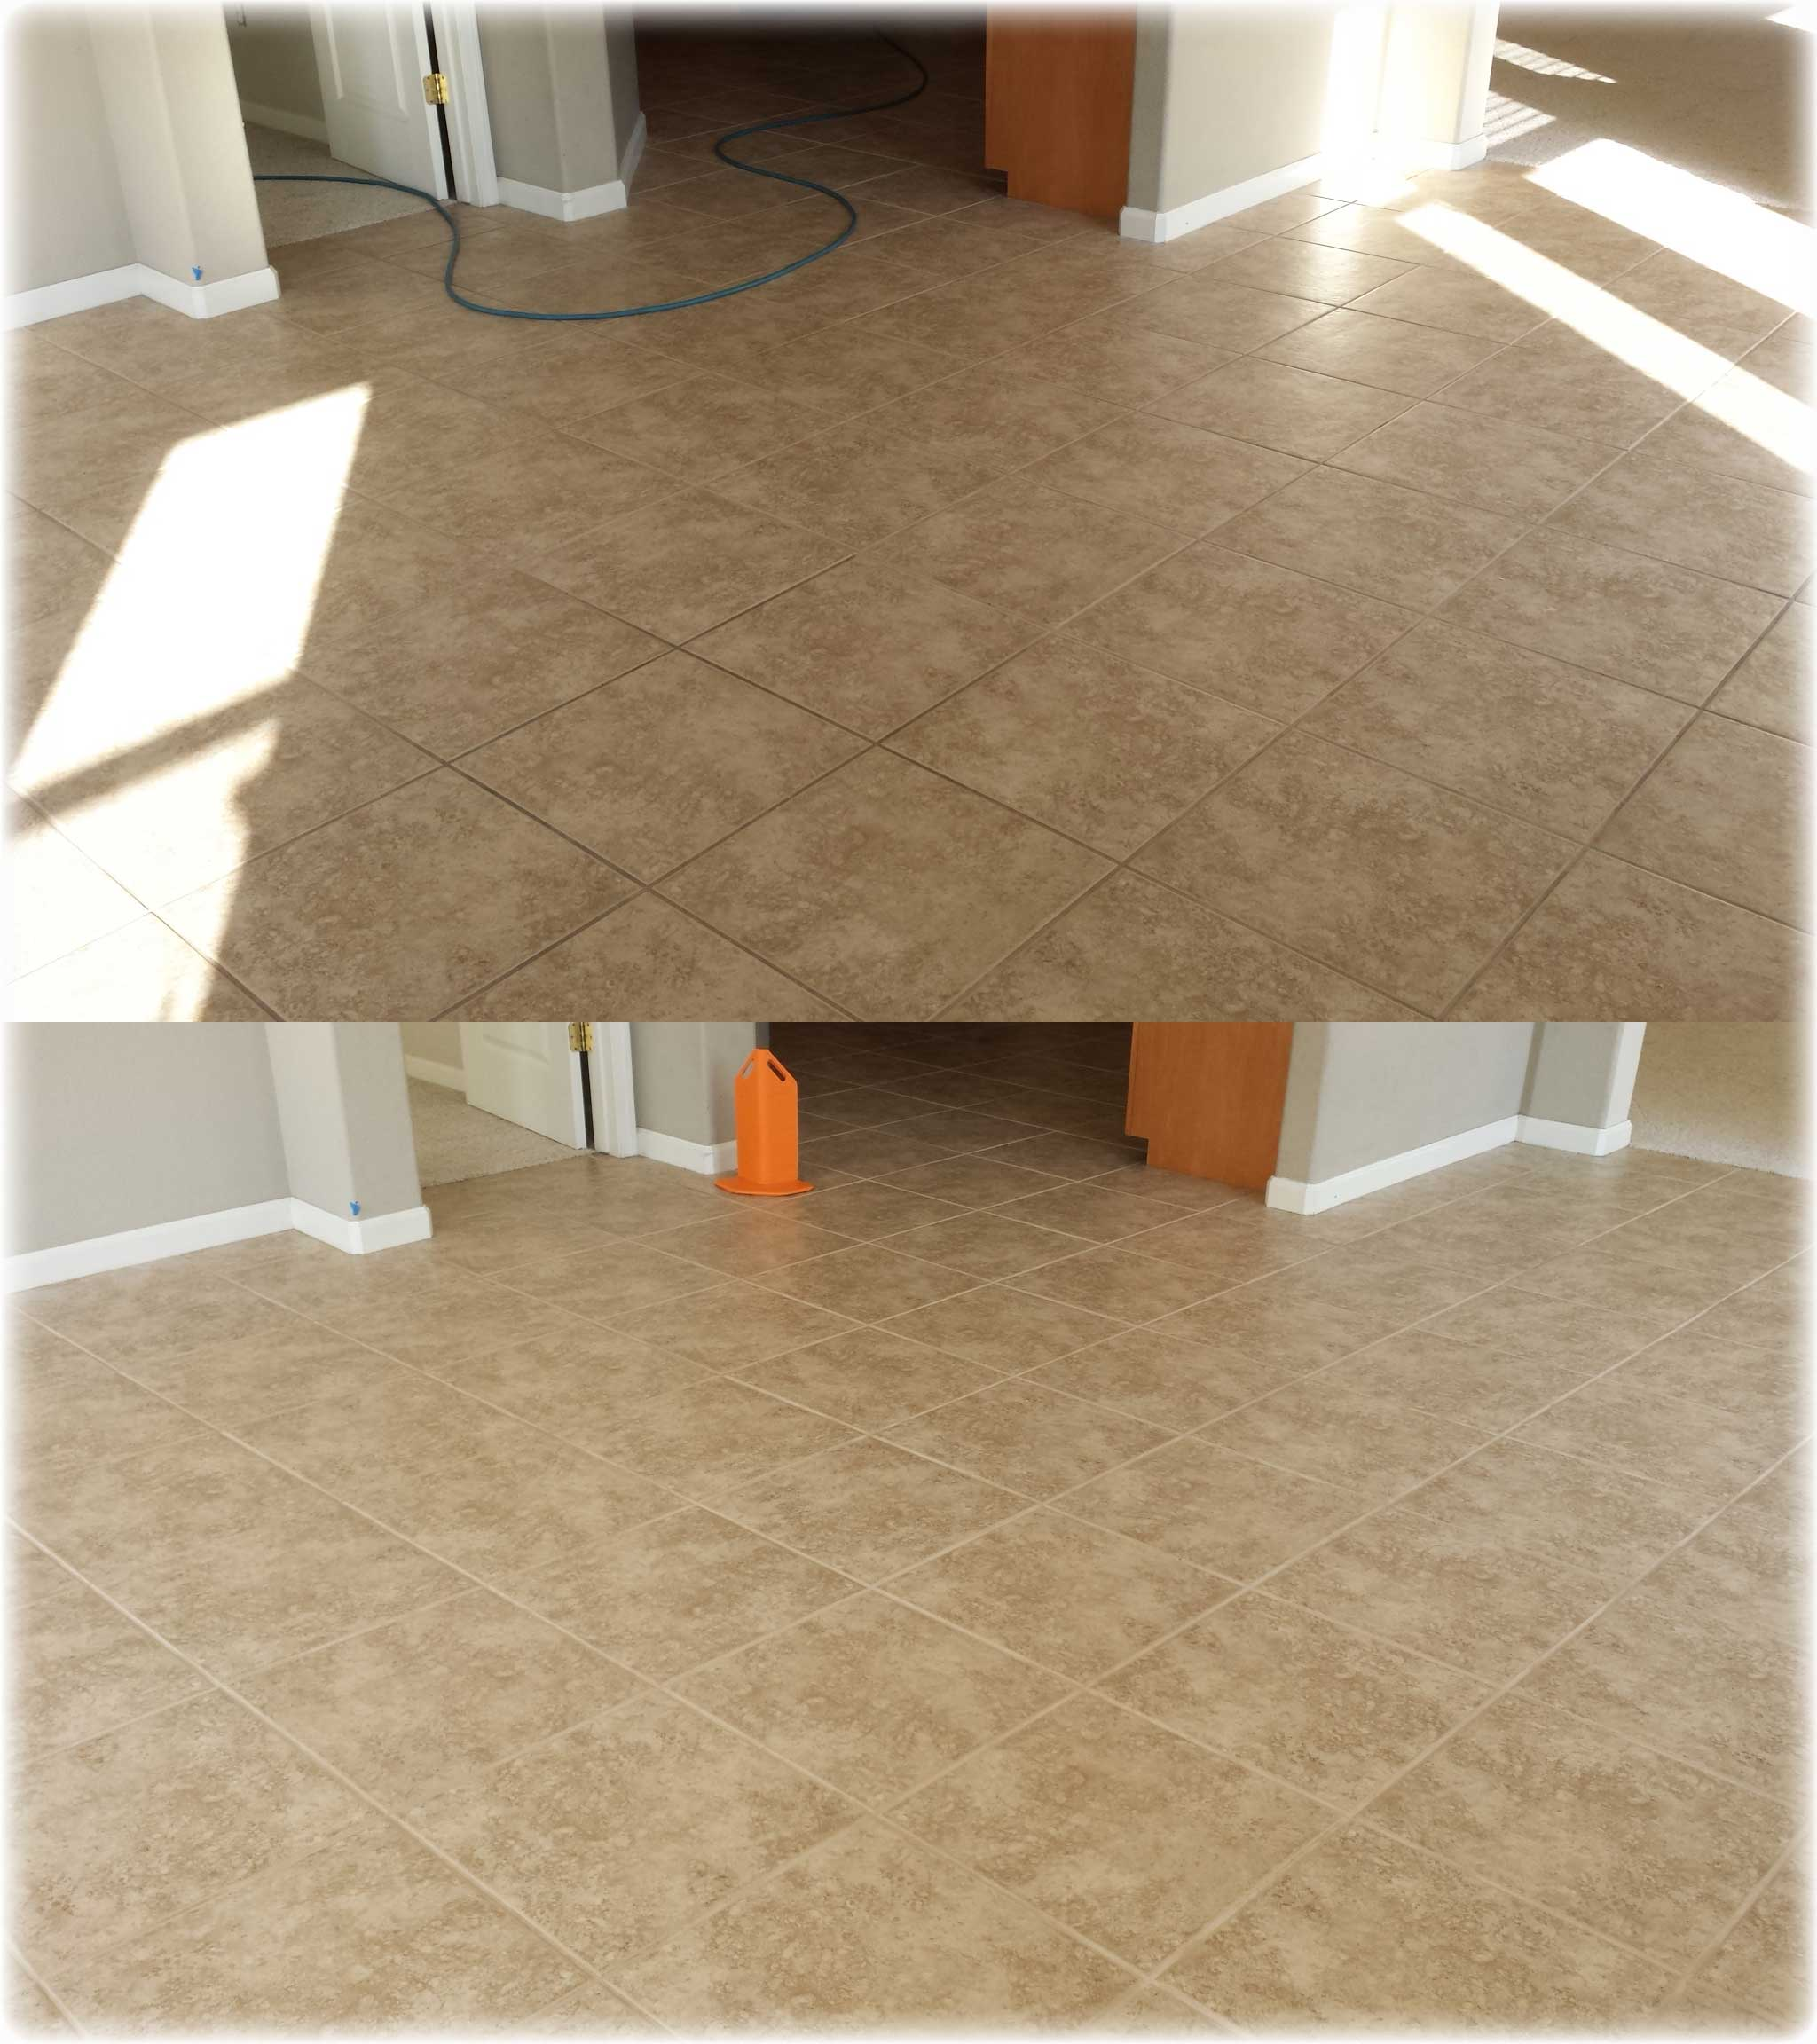 Gold Coast Flooring Gallery Carpet Cleaning Repair